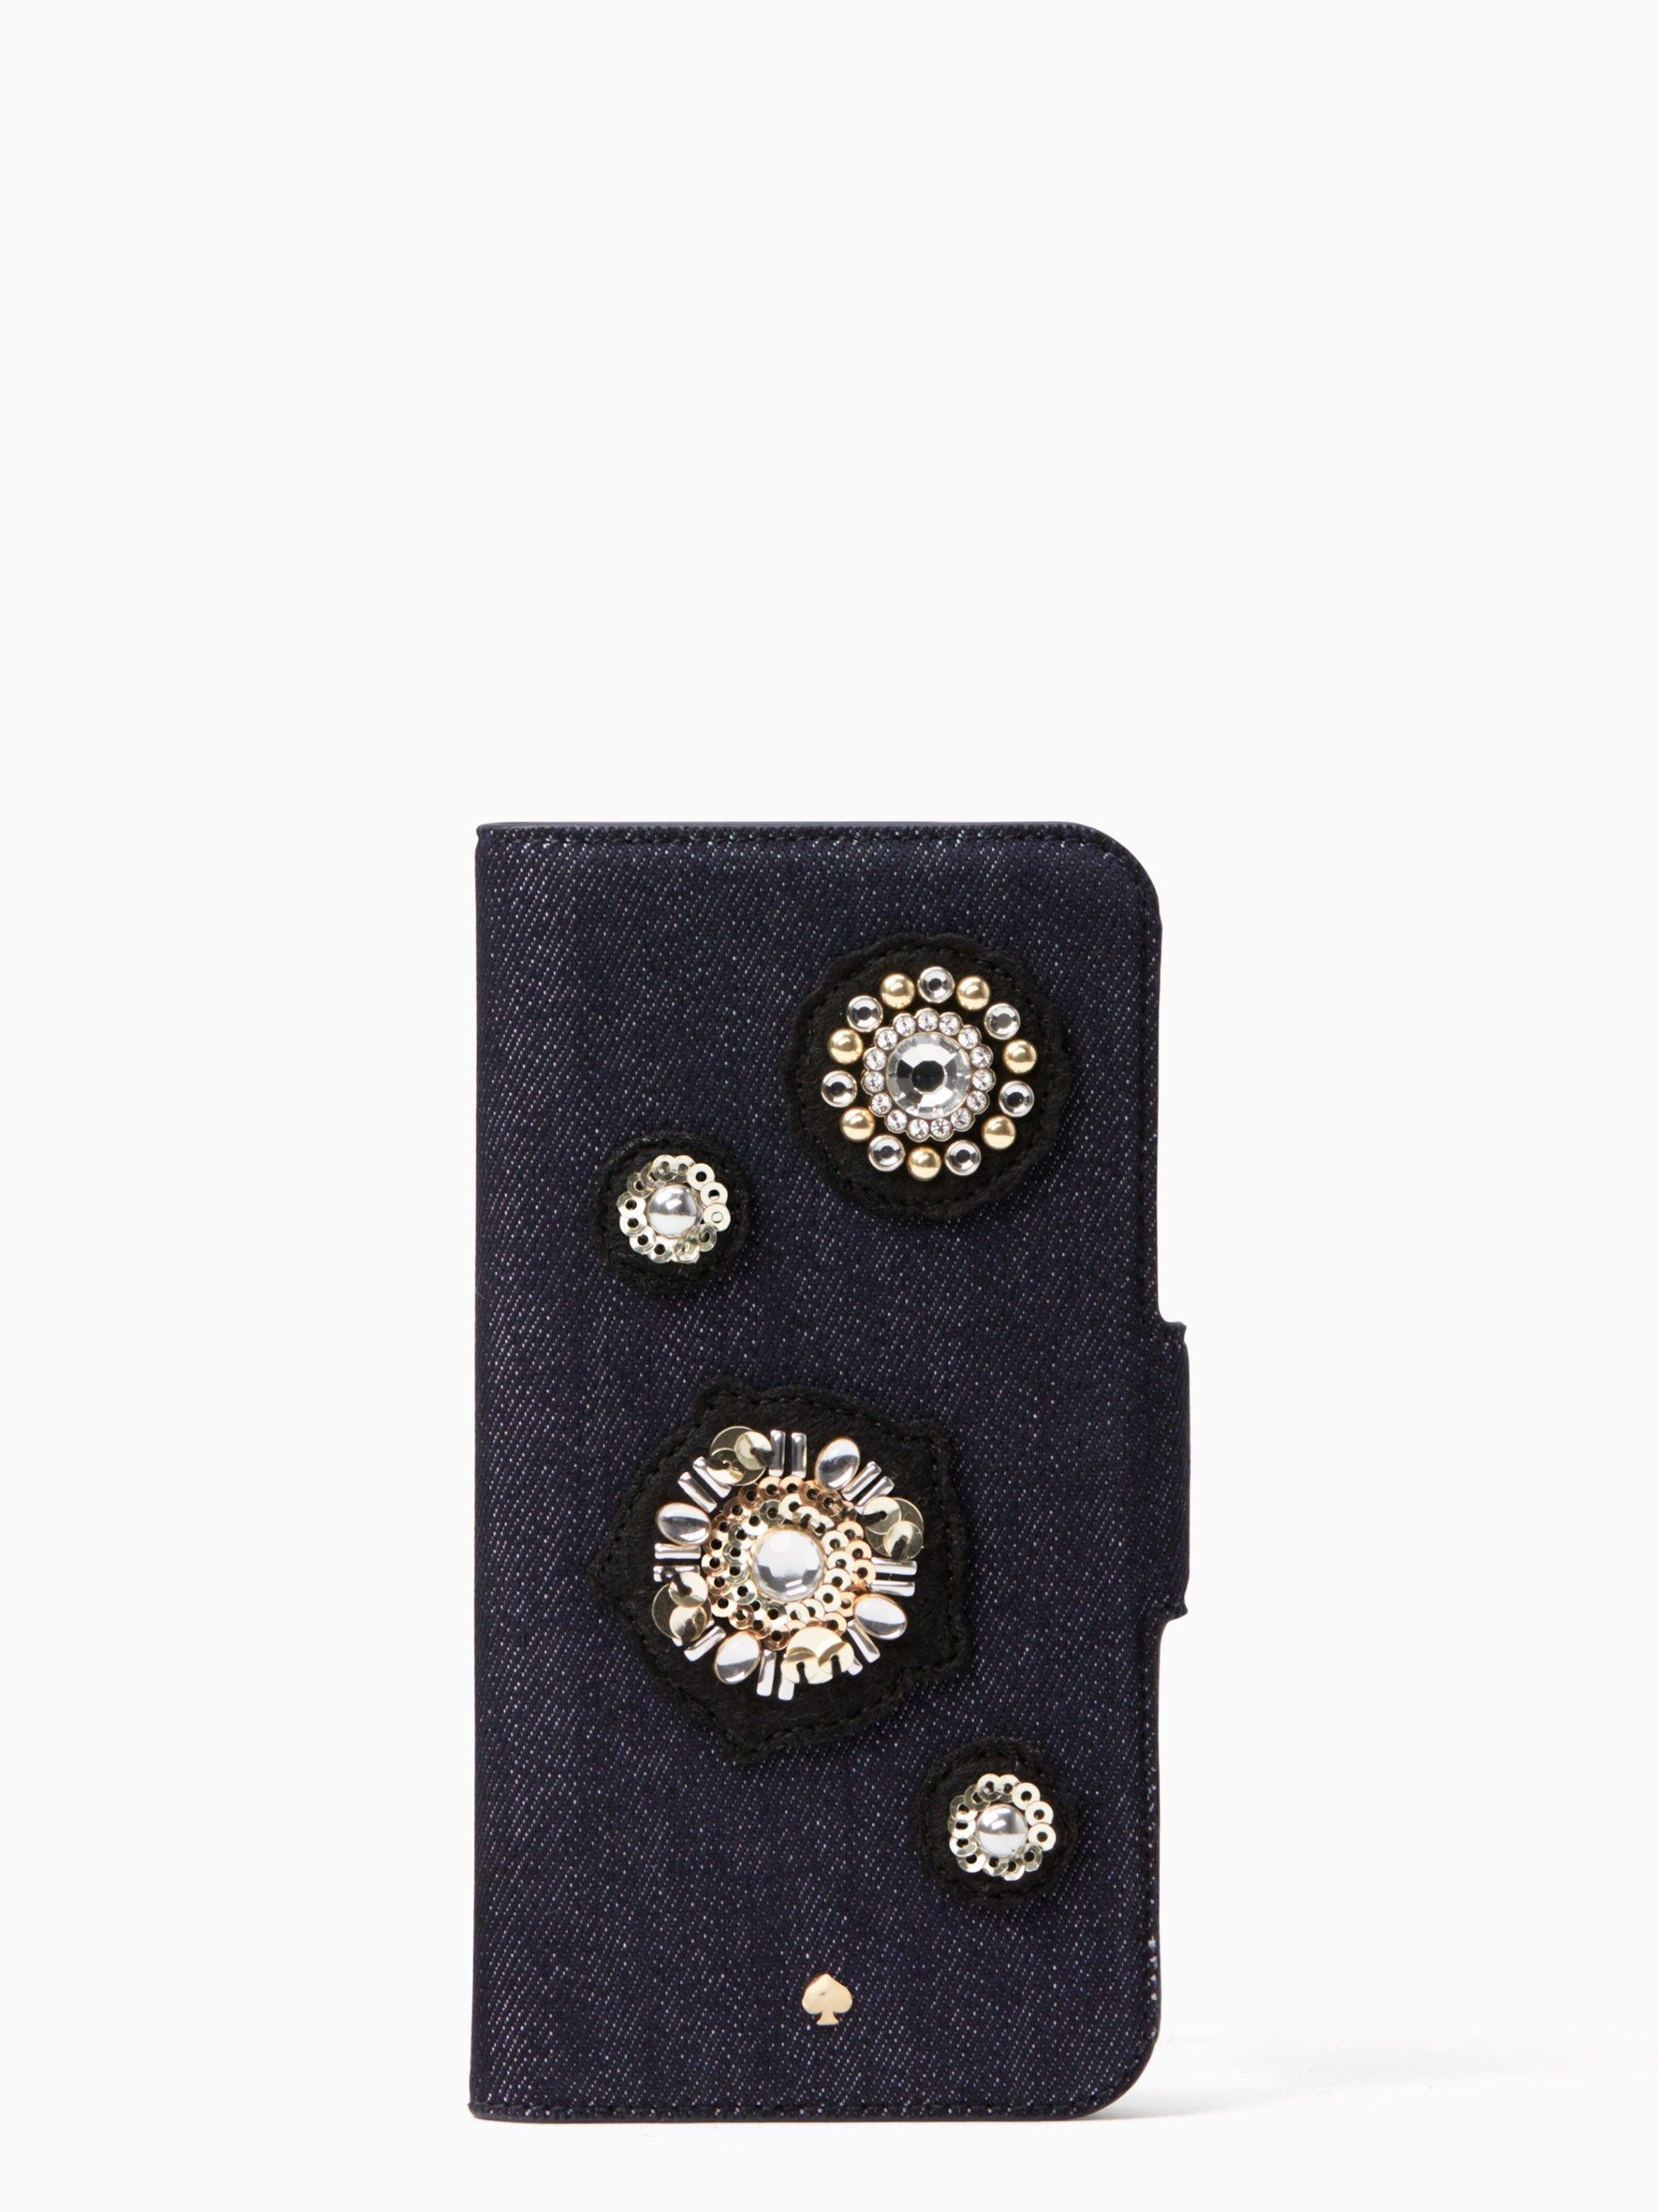 Kate spade denim embellished folio iphone 78 case multi